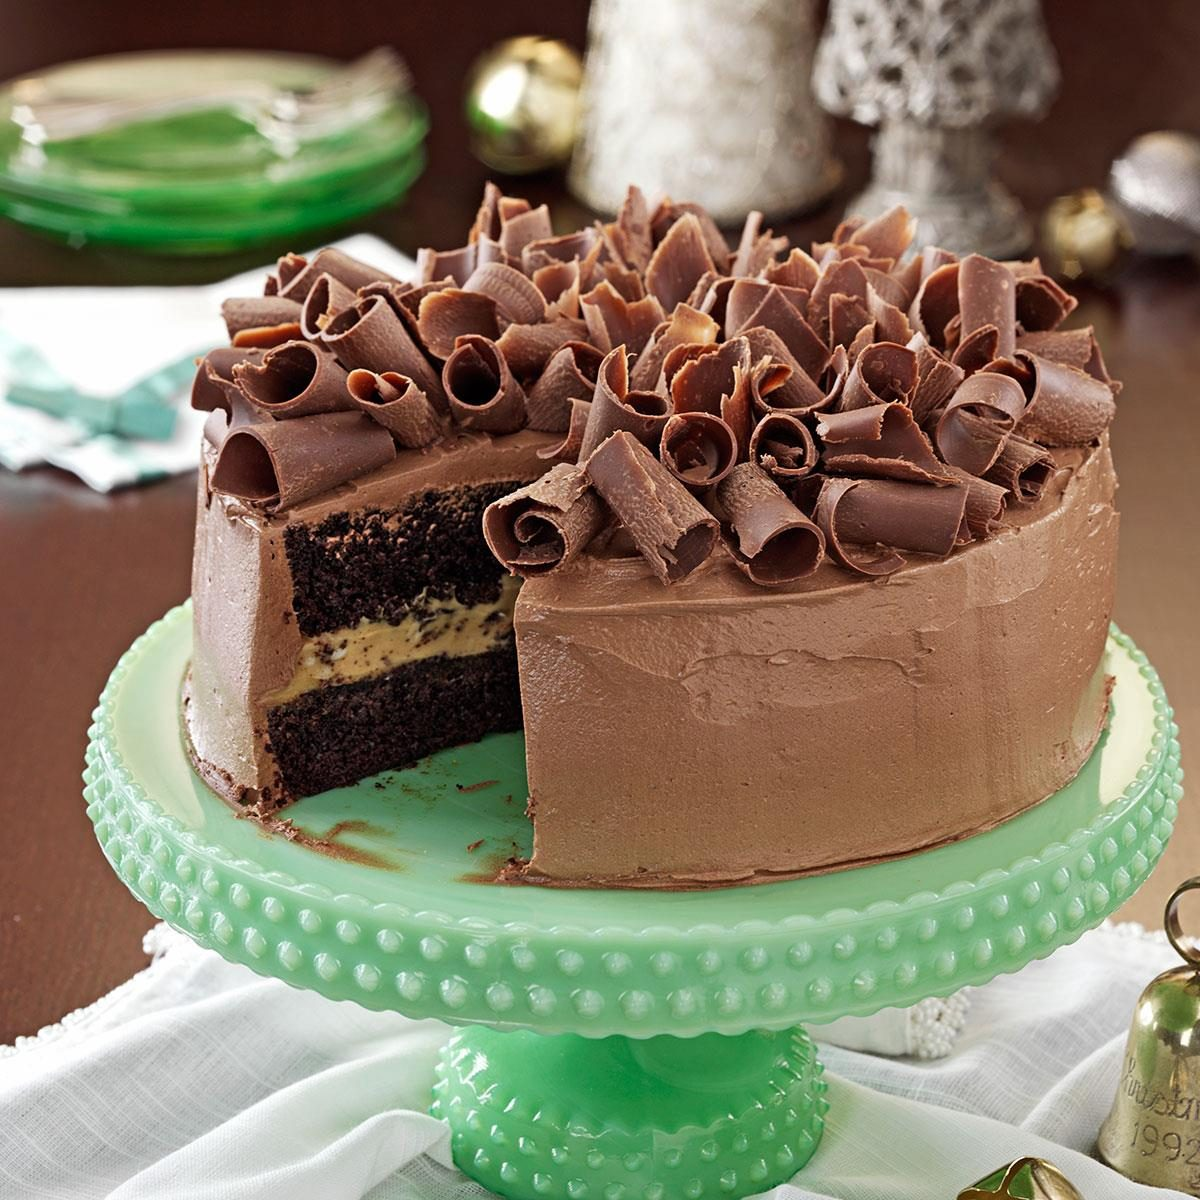 Rich Chocolate Peanut Butter Cake Recipe   Taste of Home